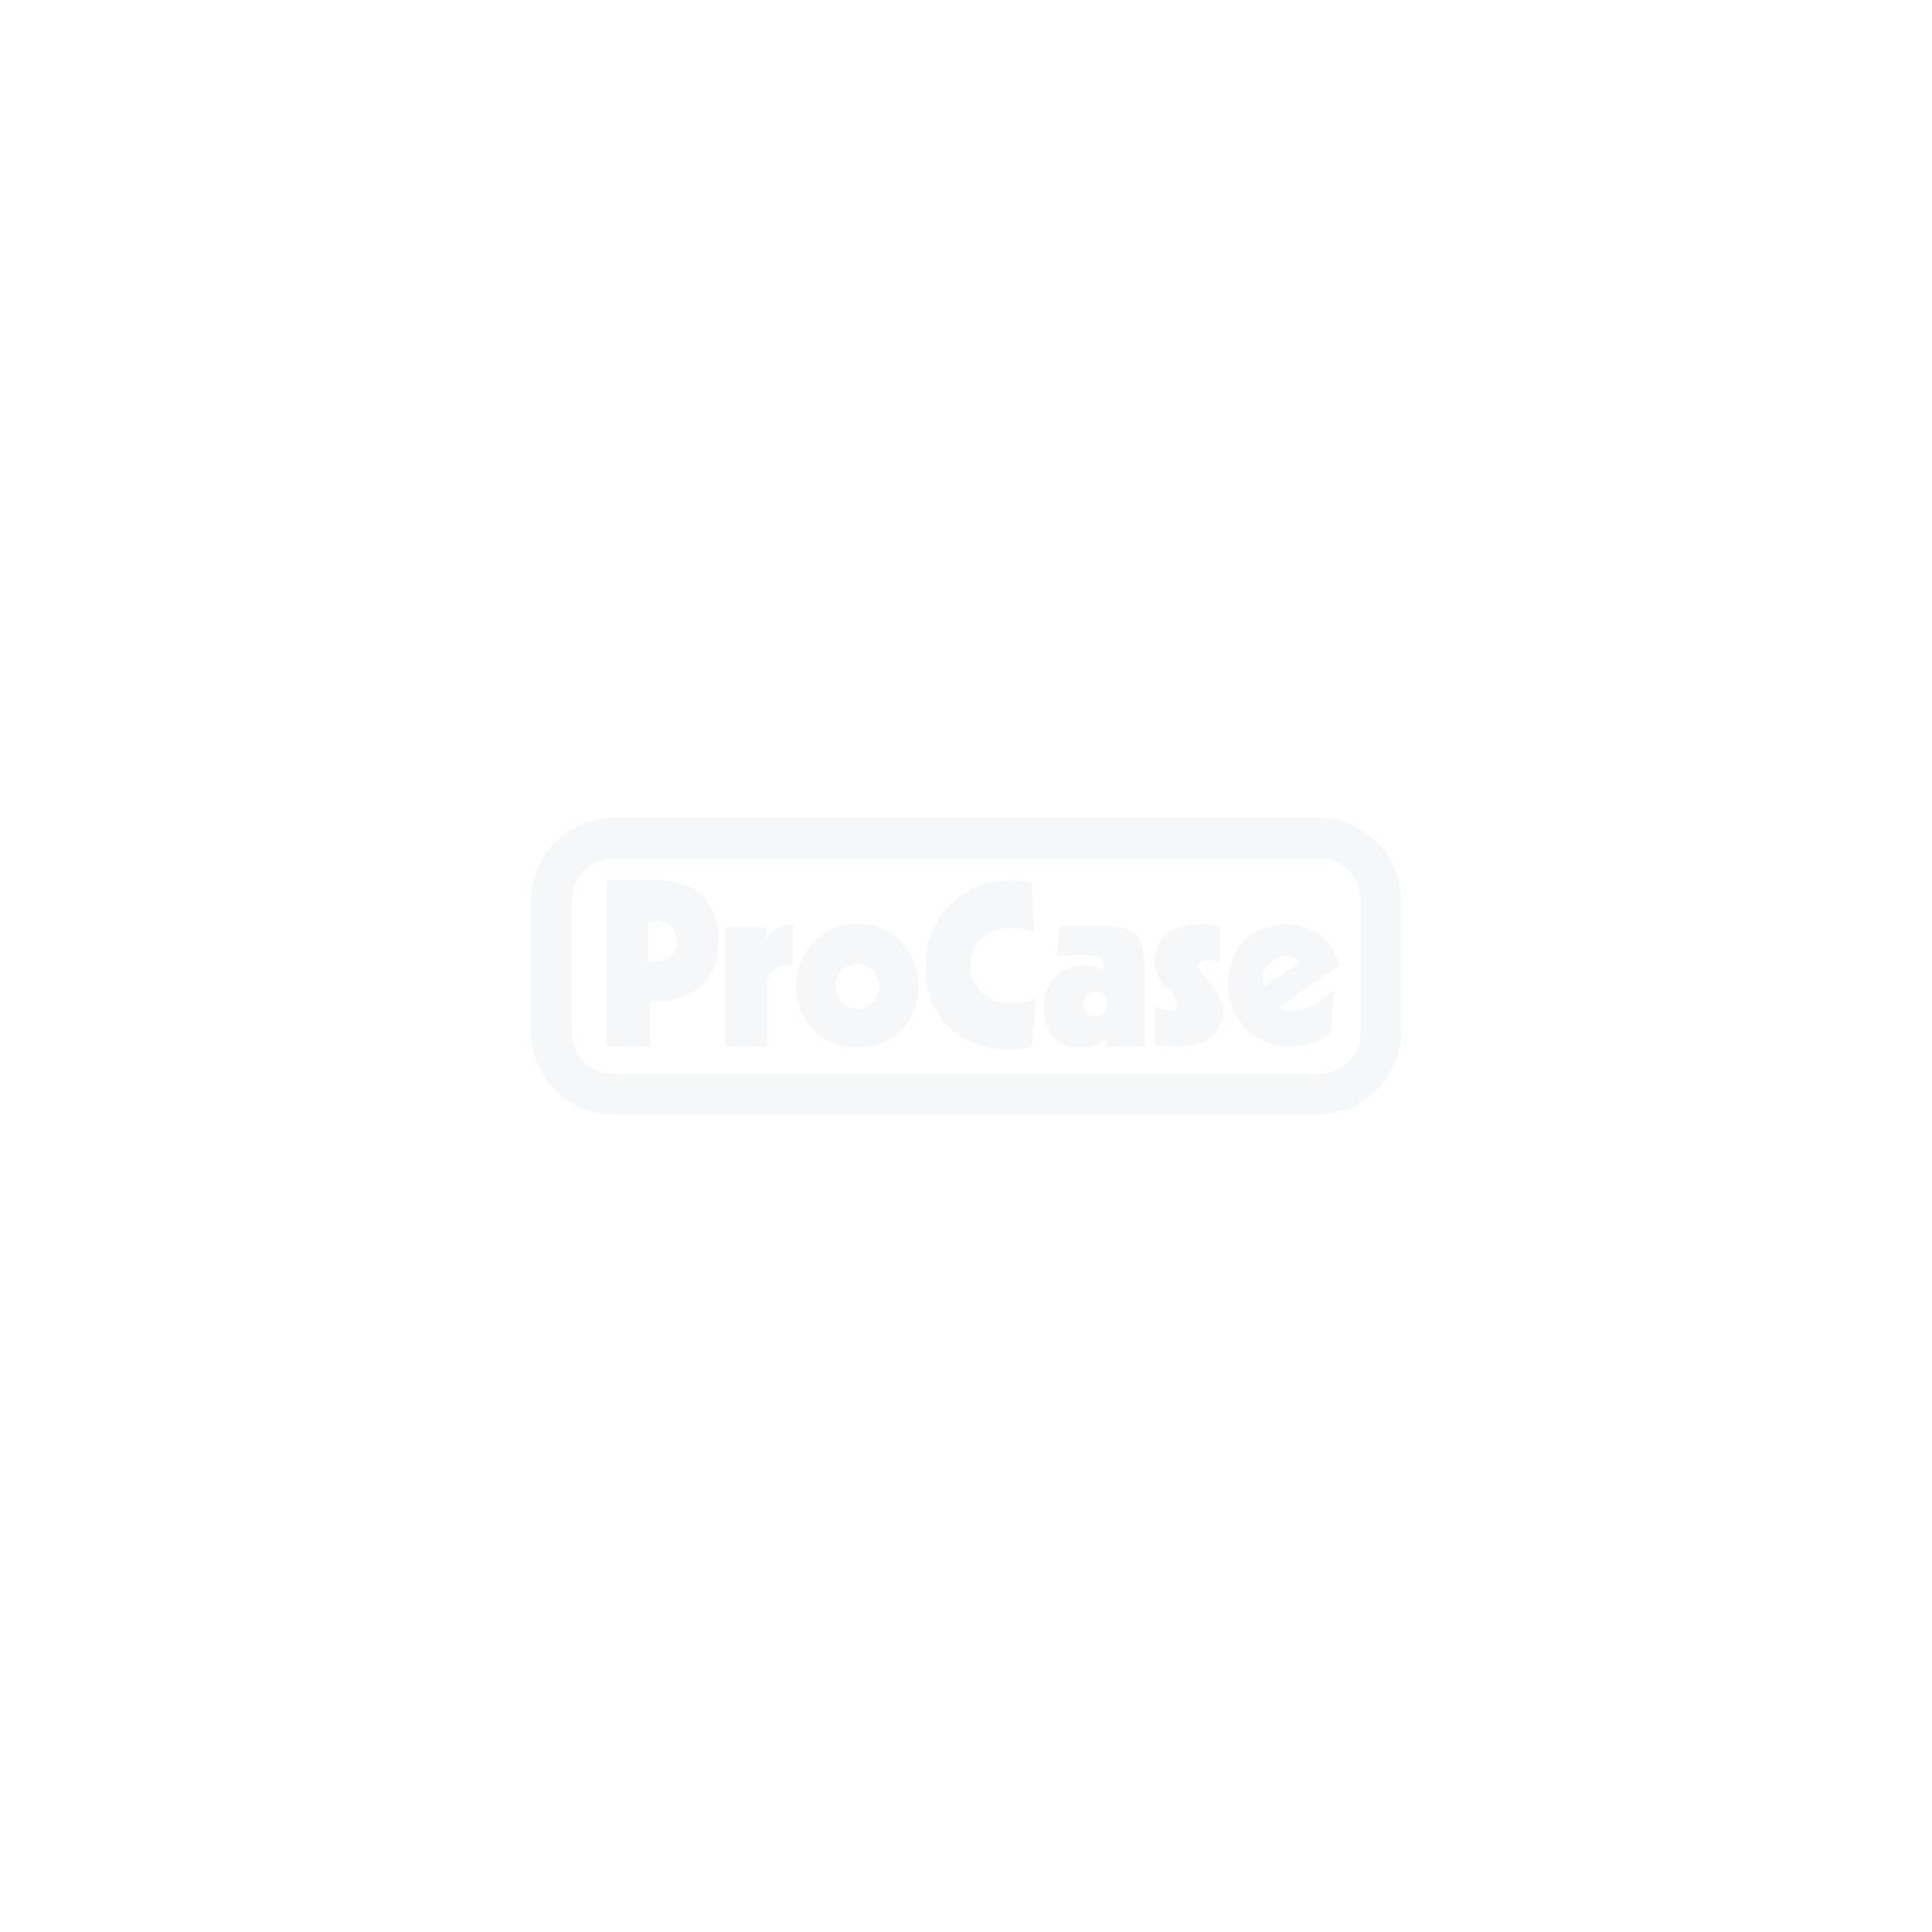 Flightcase für 4x JBLED A7 Zoom / JBLED A4 Zoom